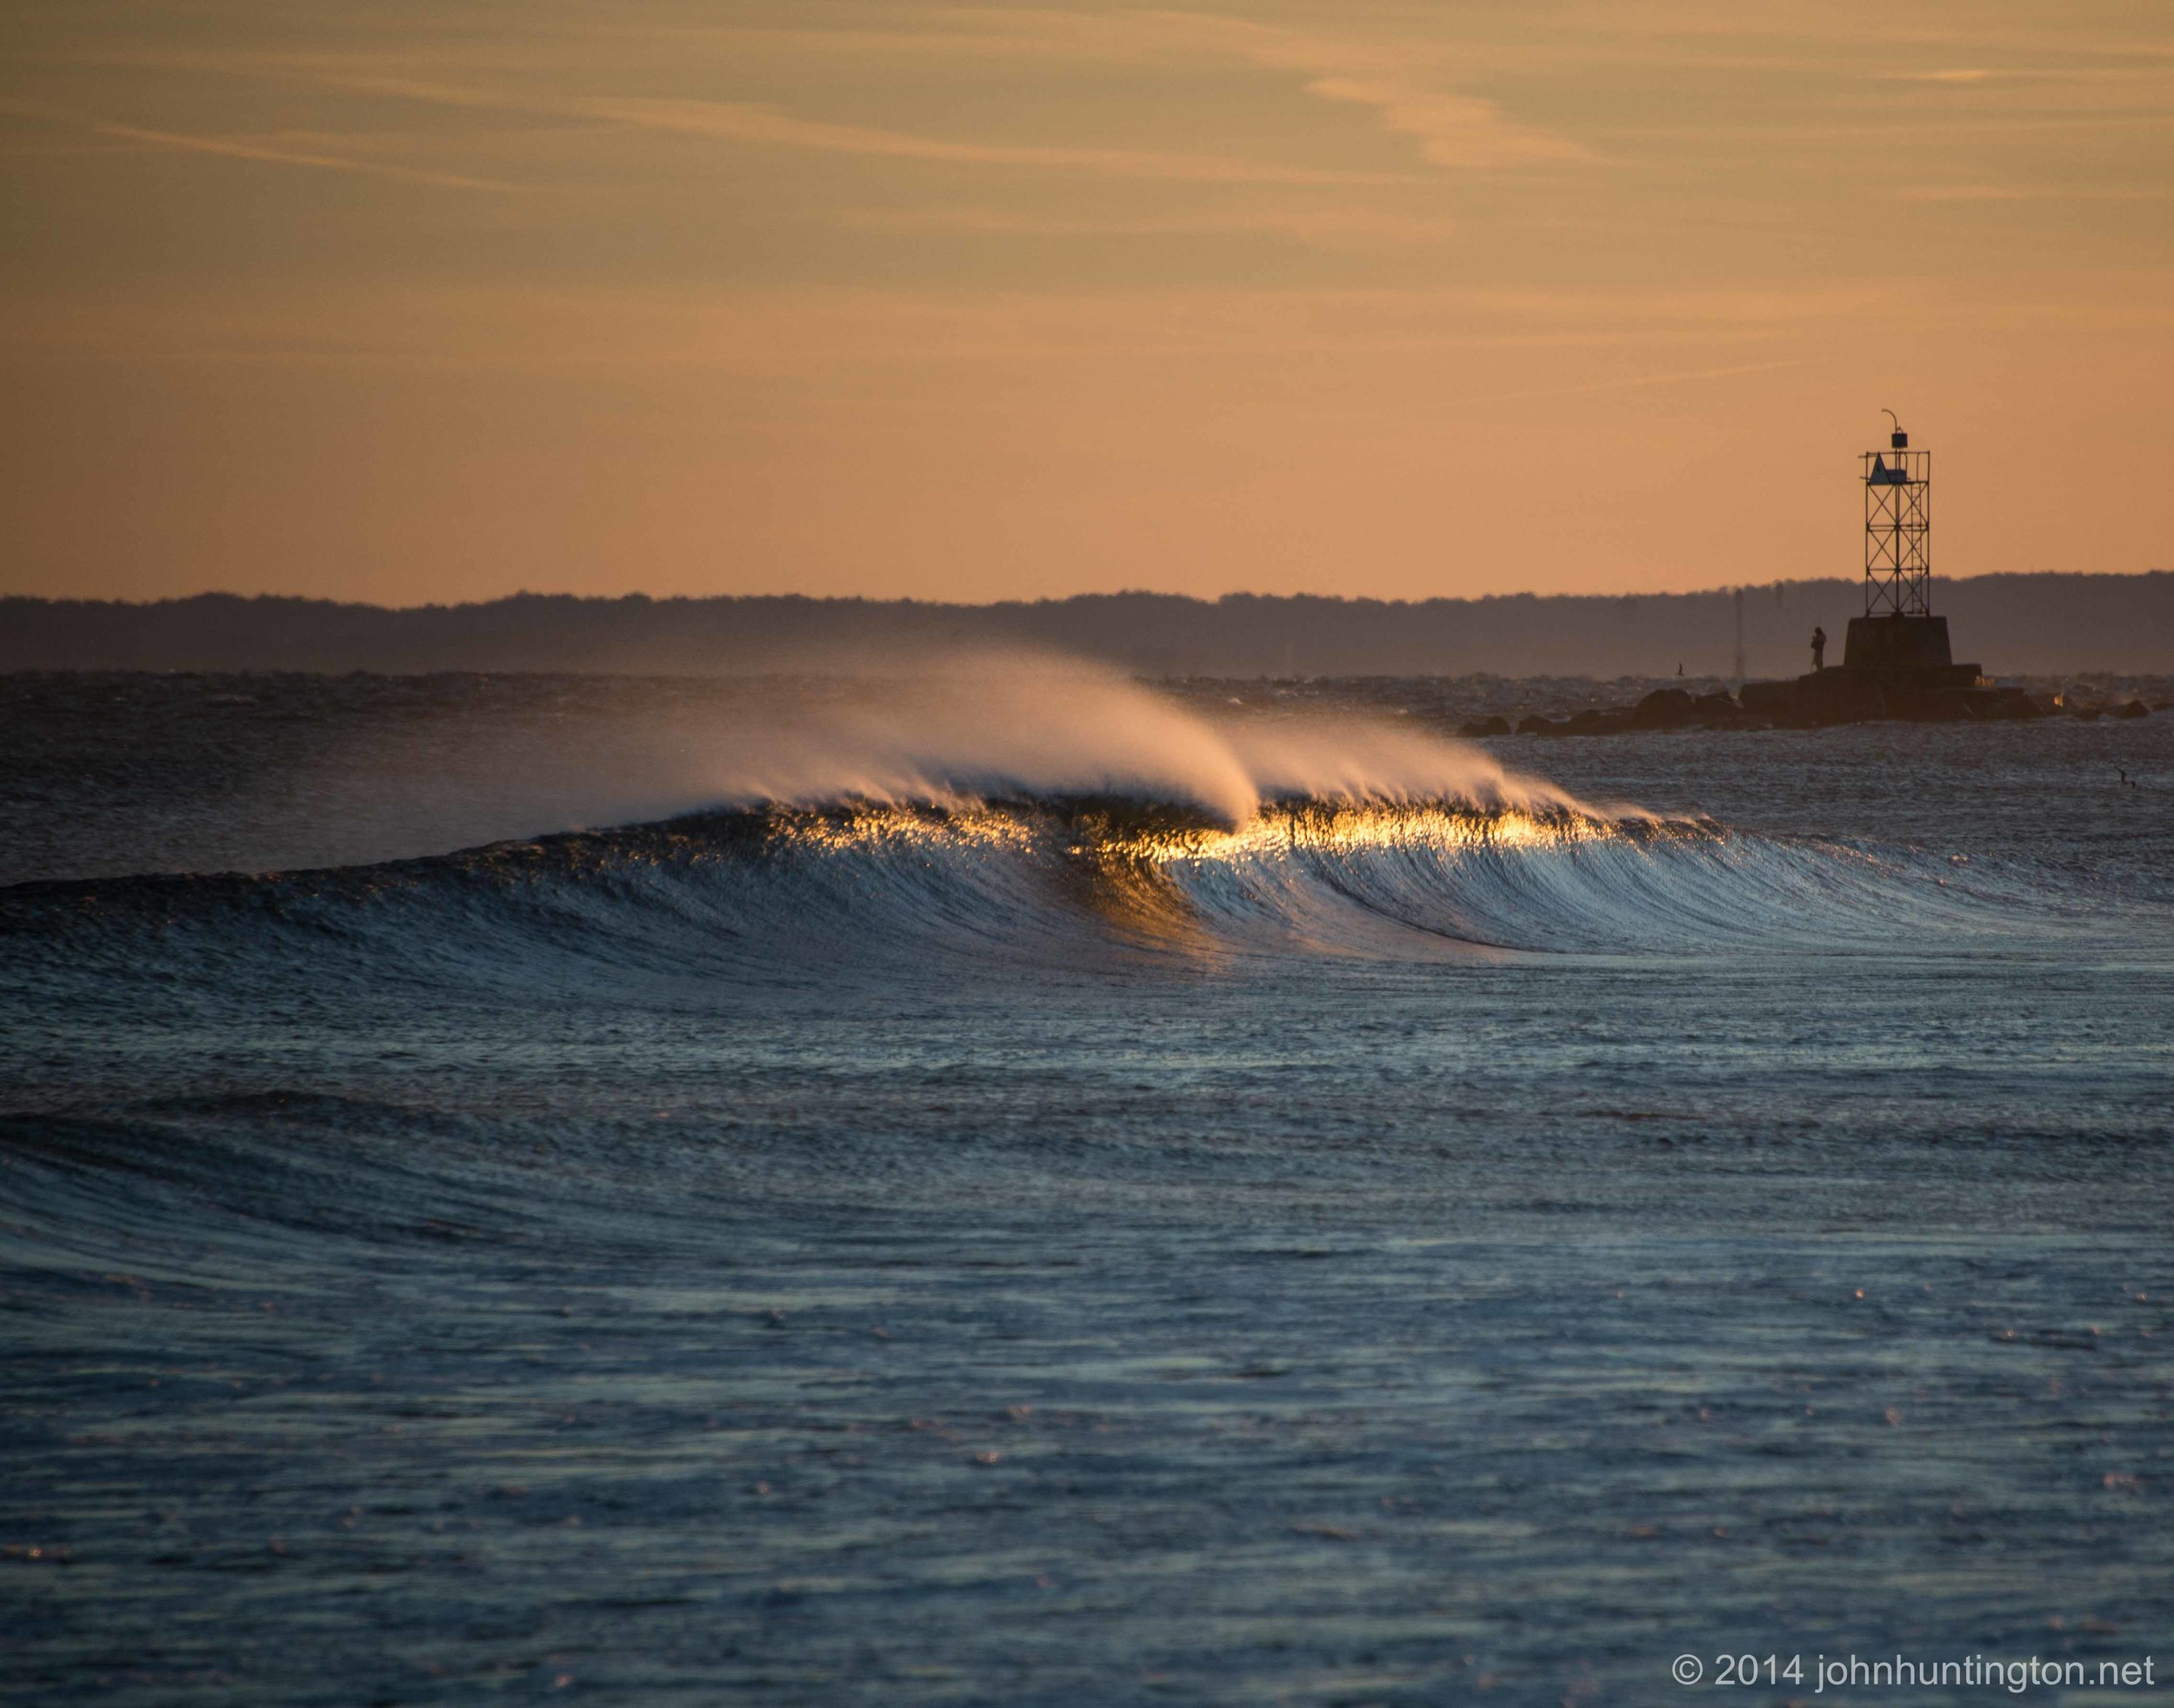 Huntington-20141019-DSC_3771.jpg